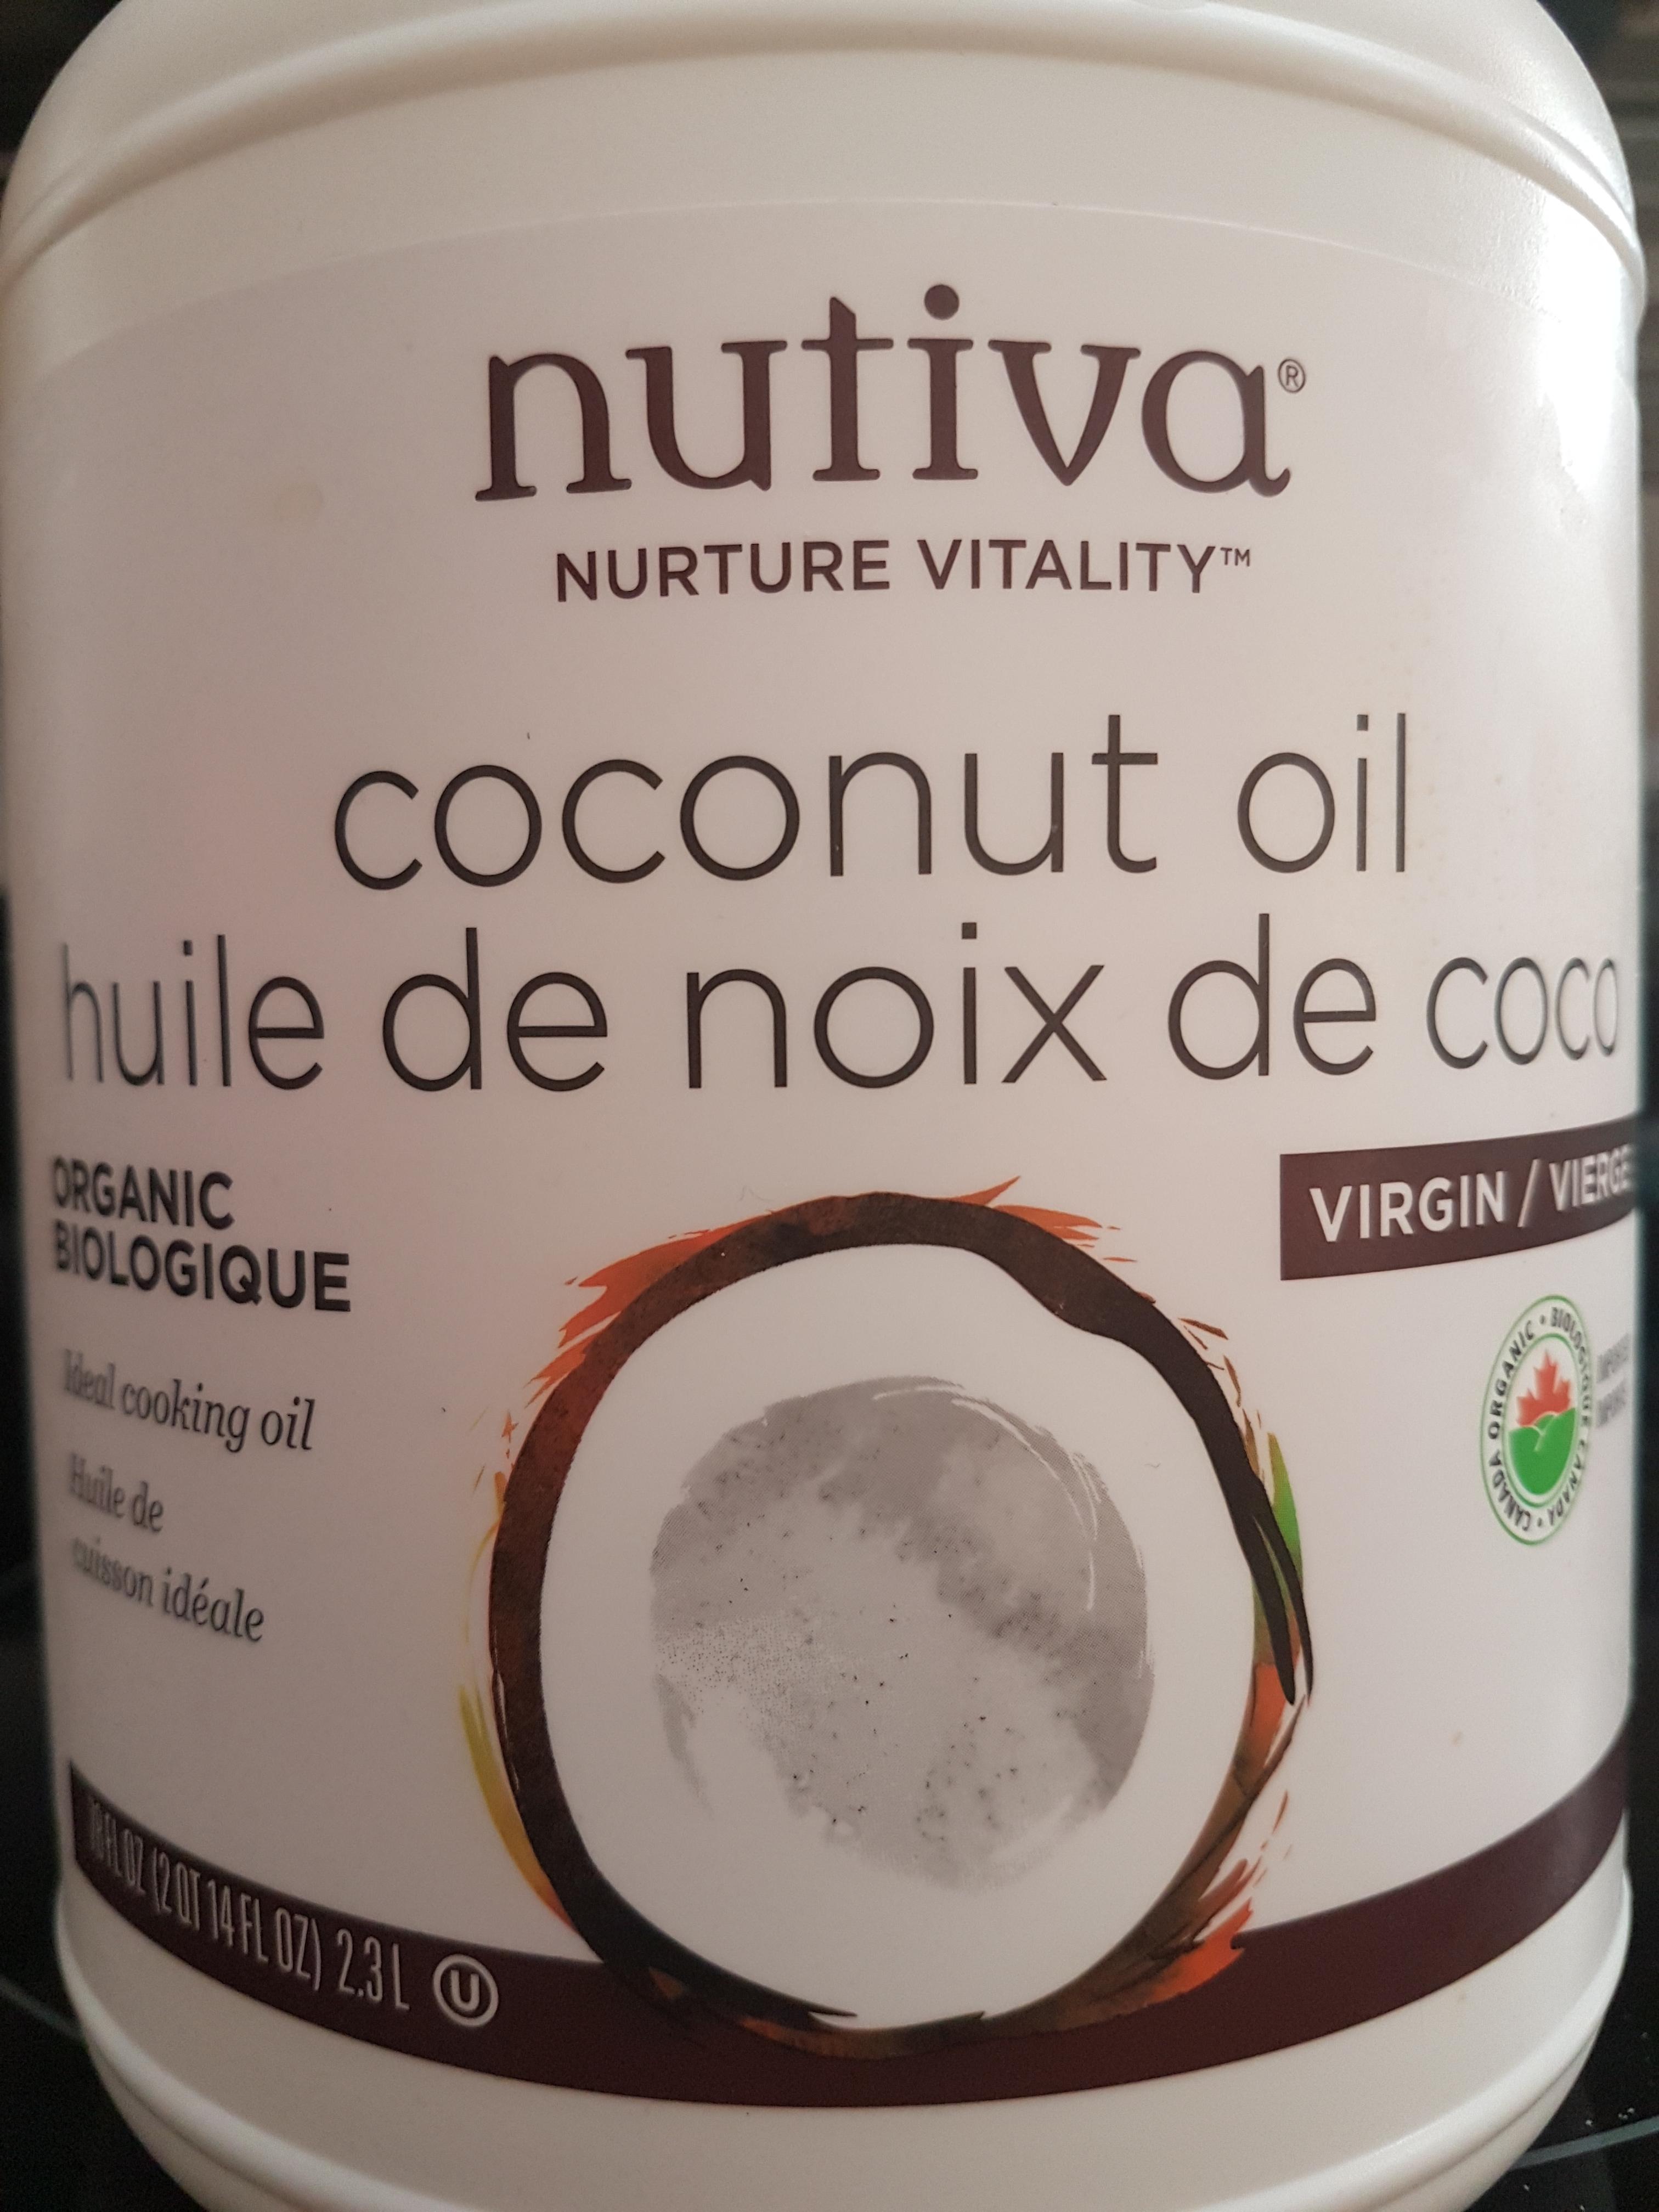 Nutiva Organic Virgin Coconut Oil reviews in Oils & Vinegars